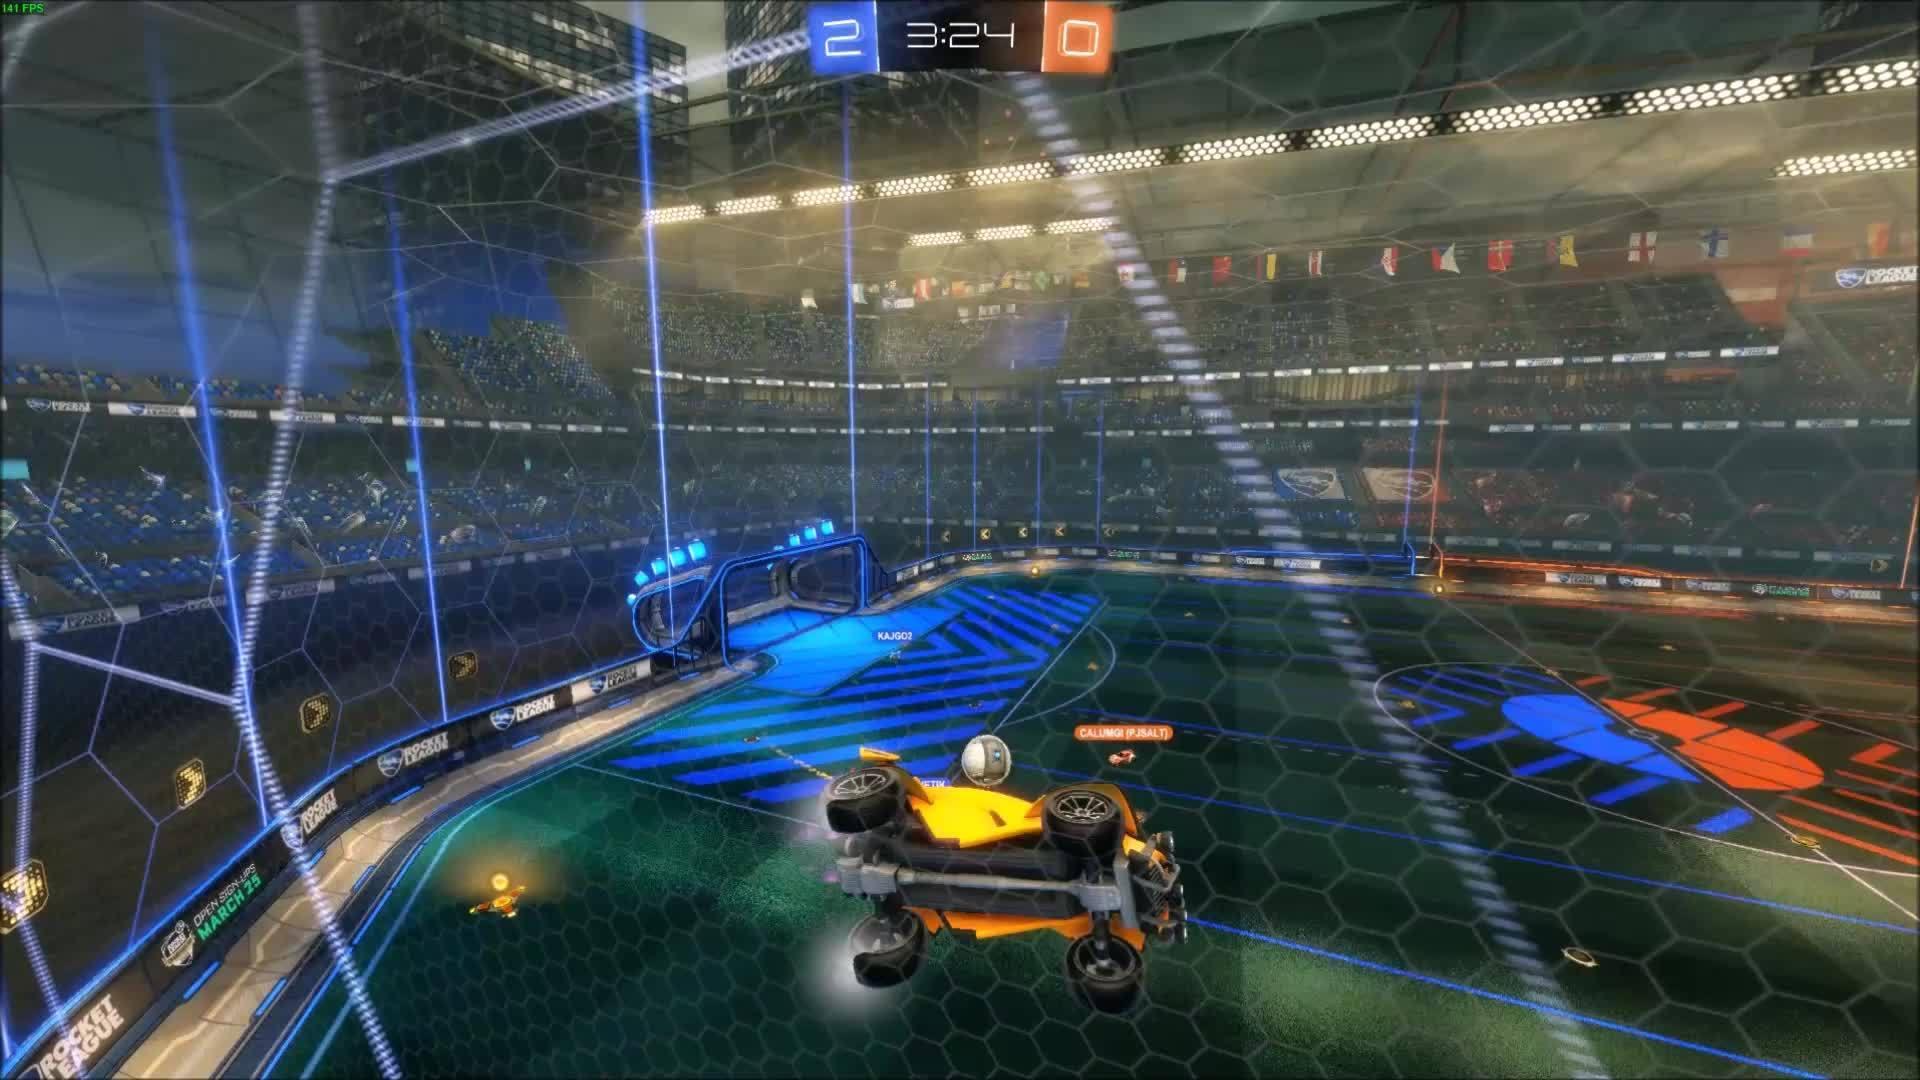 Rocket League, beyondthegame, gaming, rocketleague,  GIFs